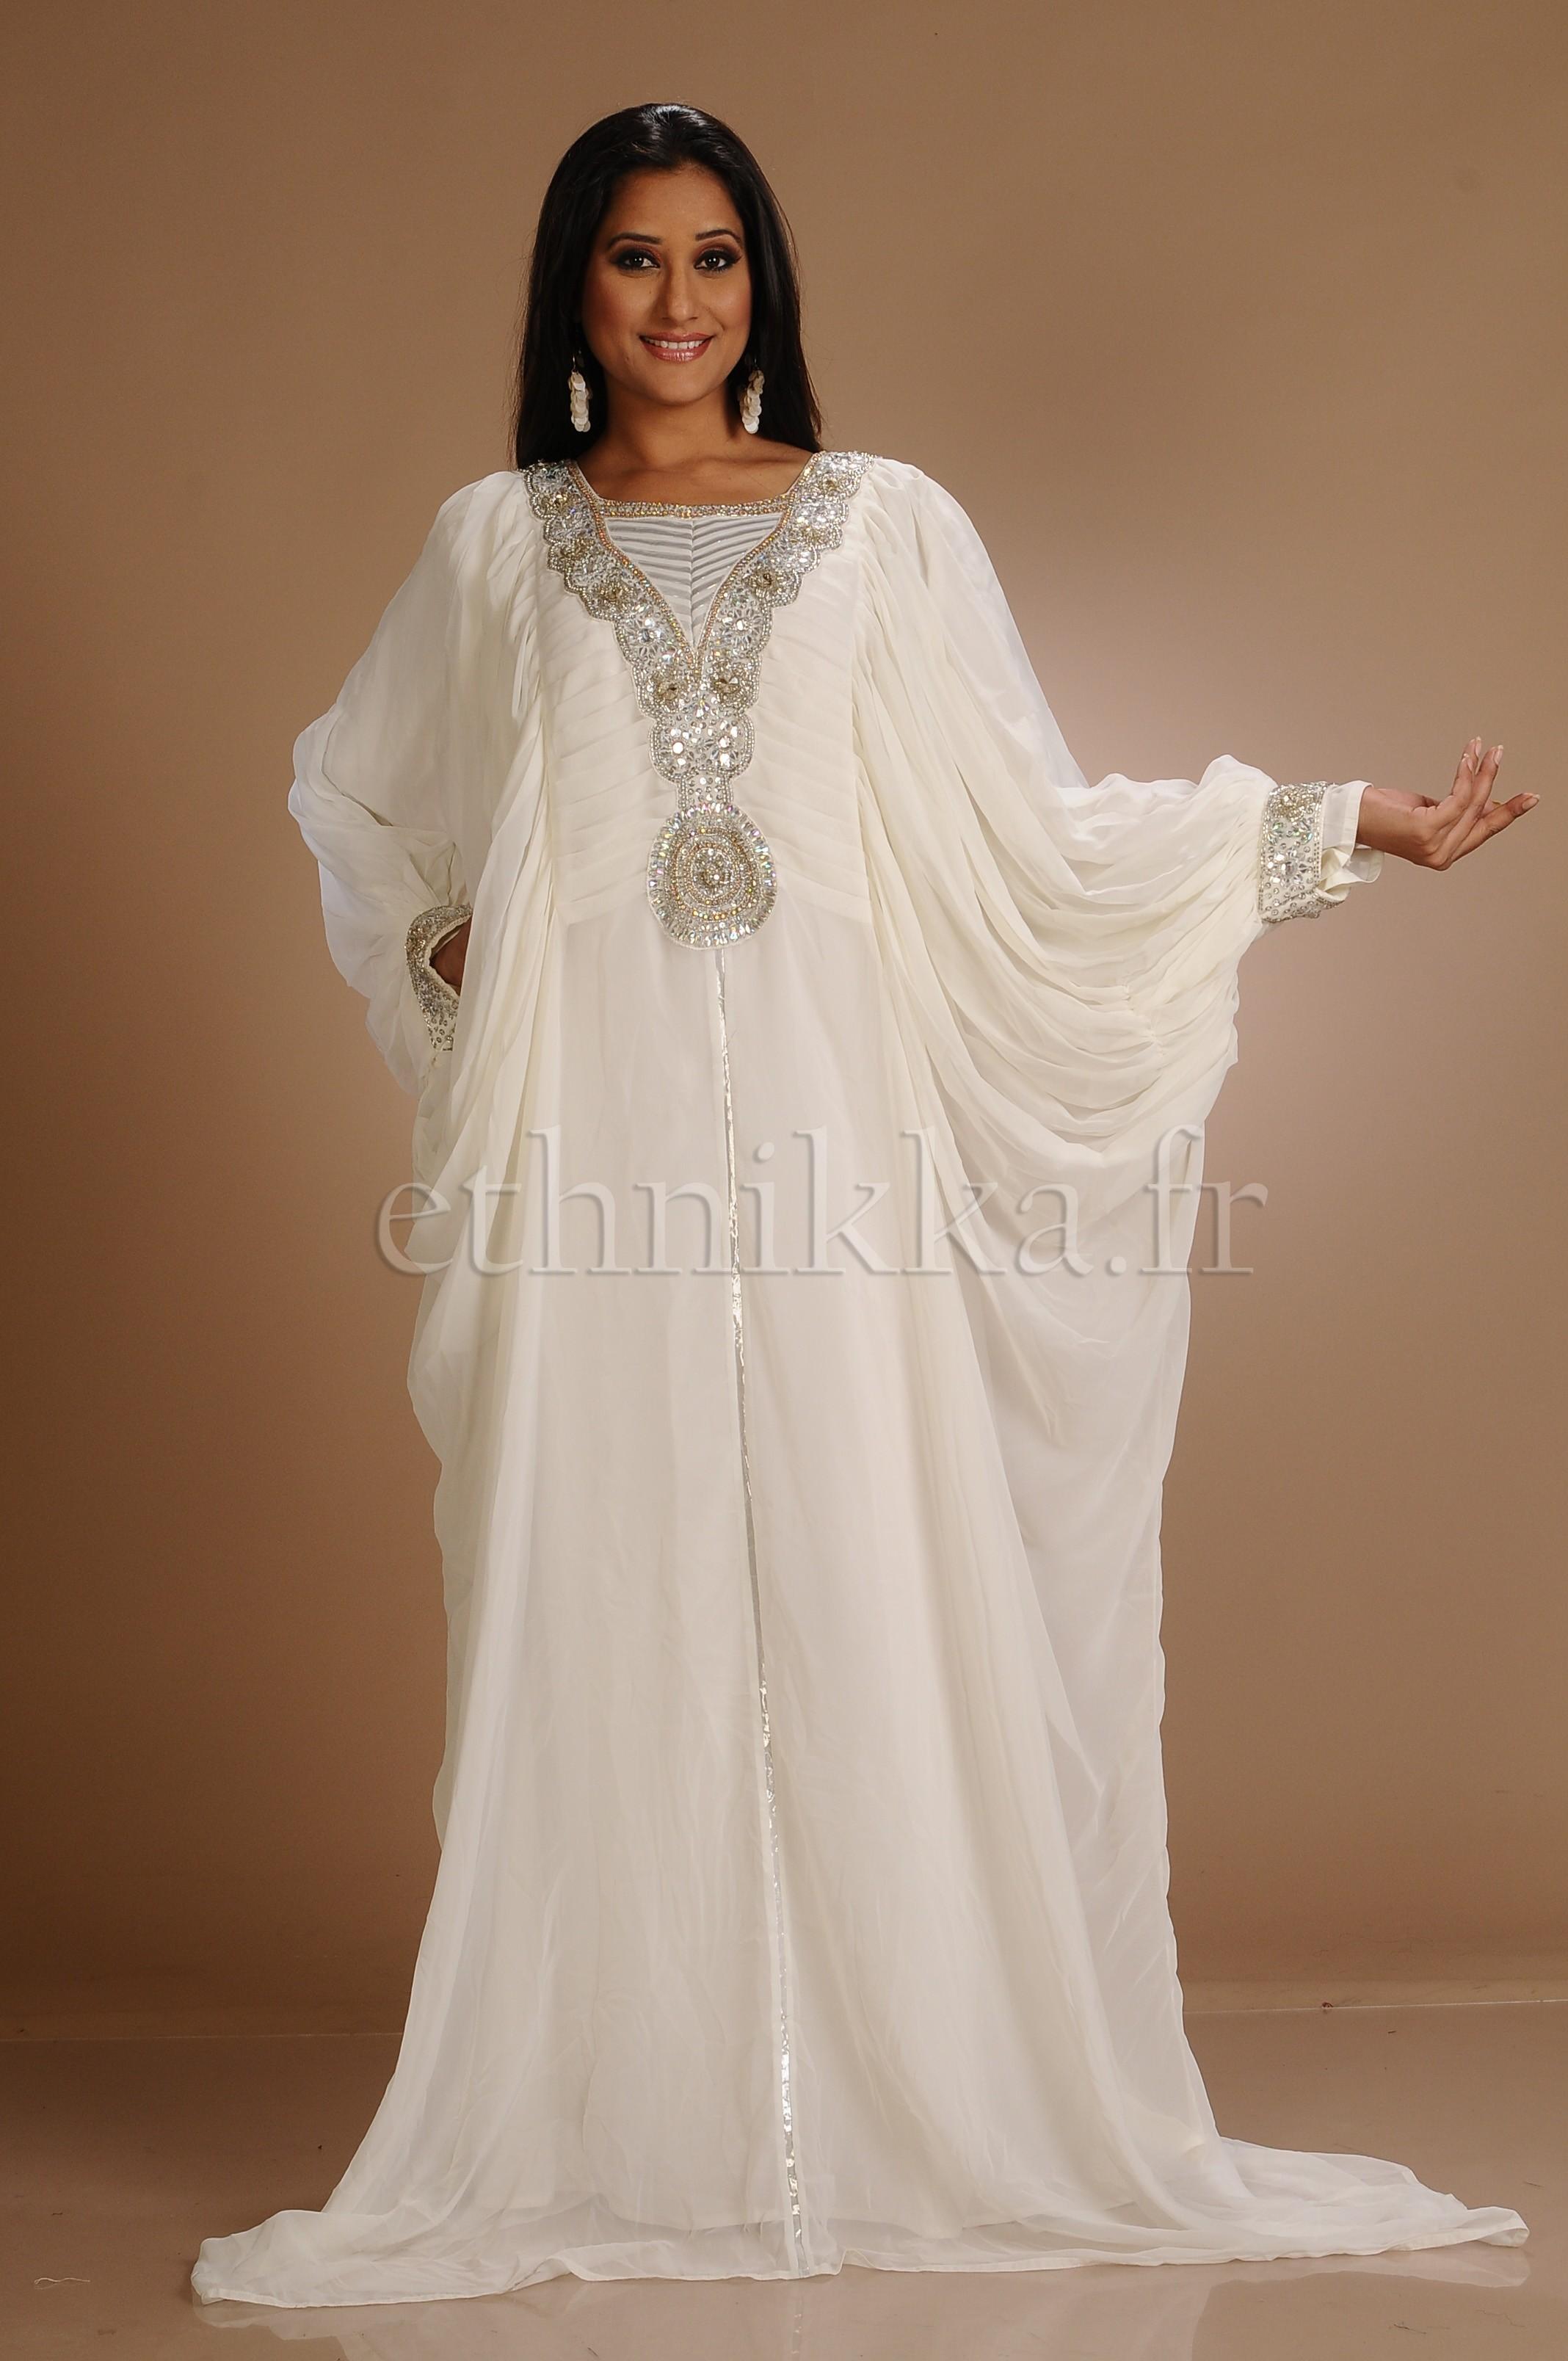 Robes soiree orientale dubai